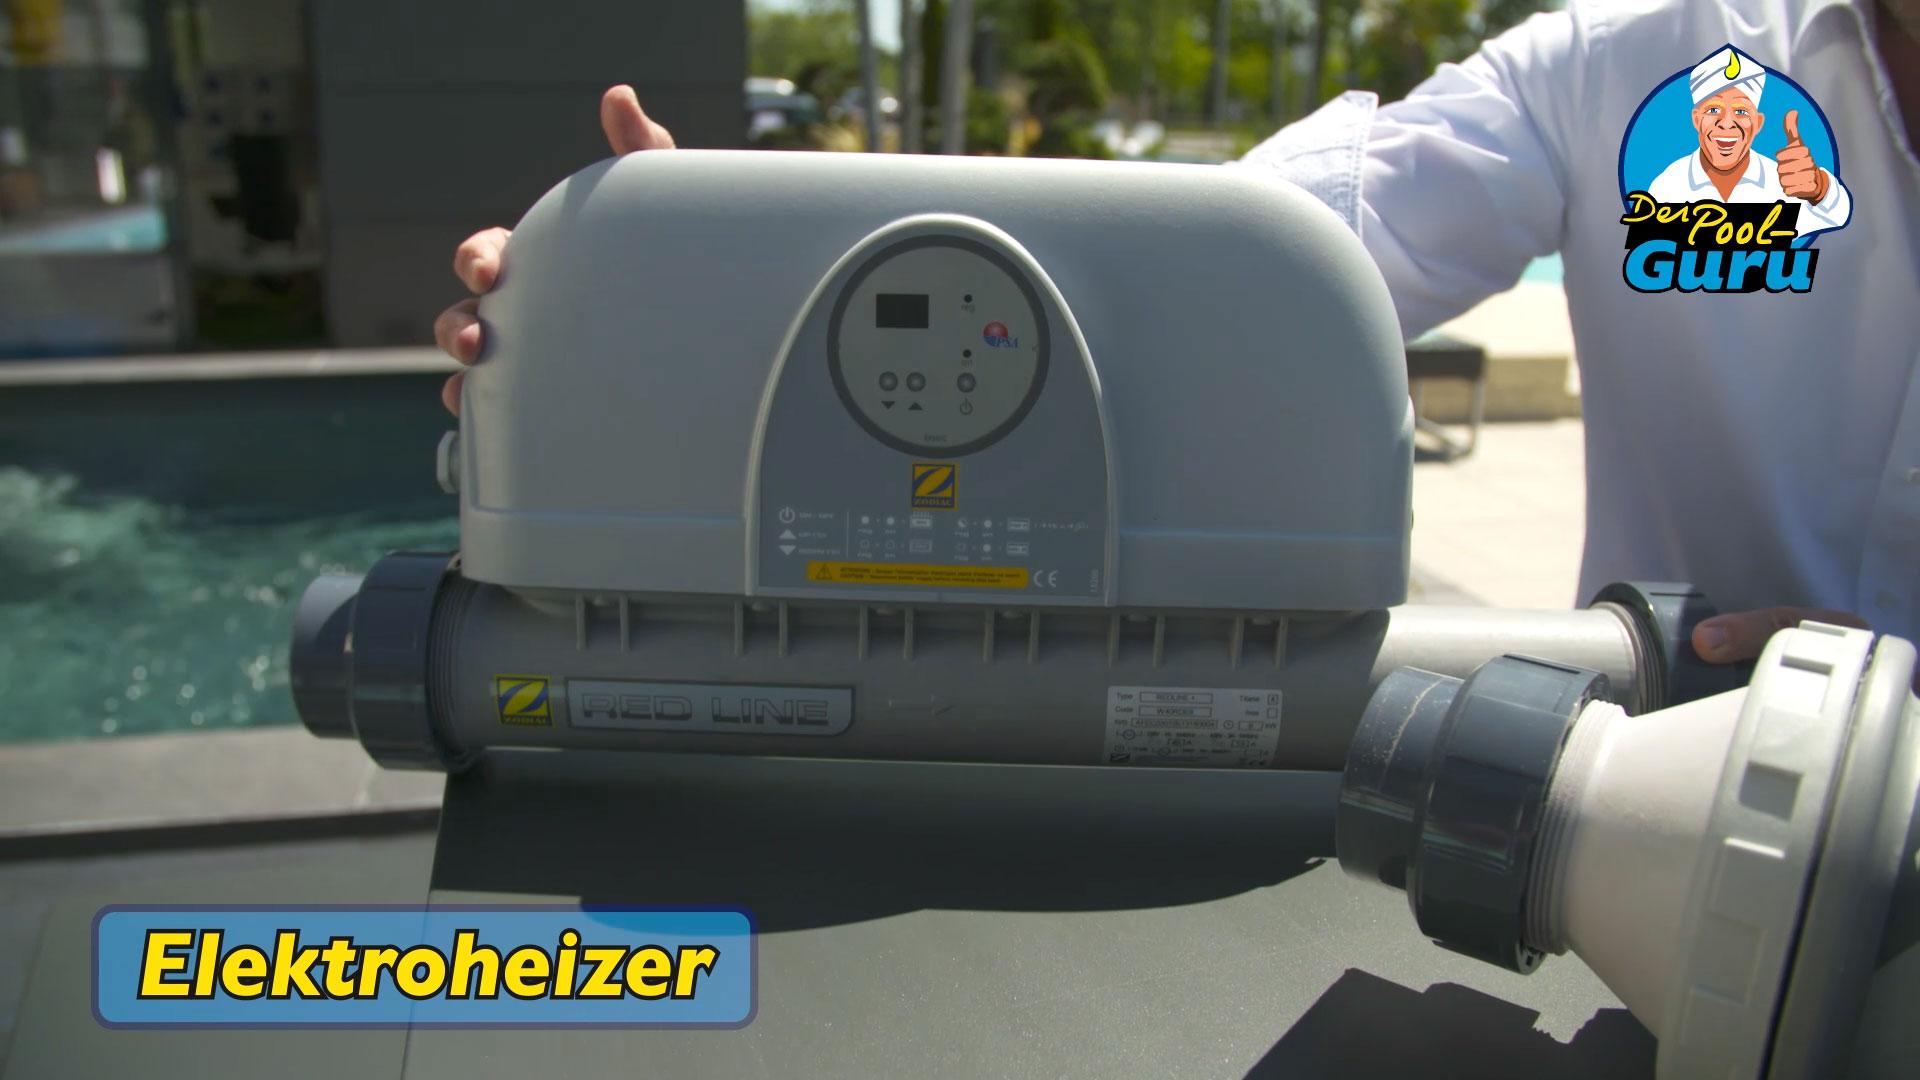 Poolheizung Elektroheizer